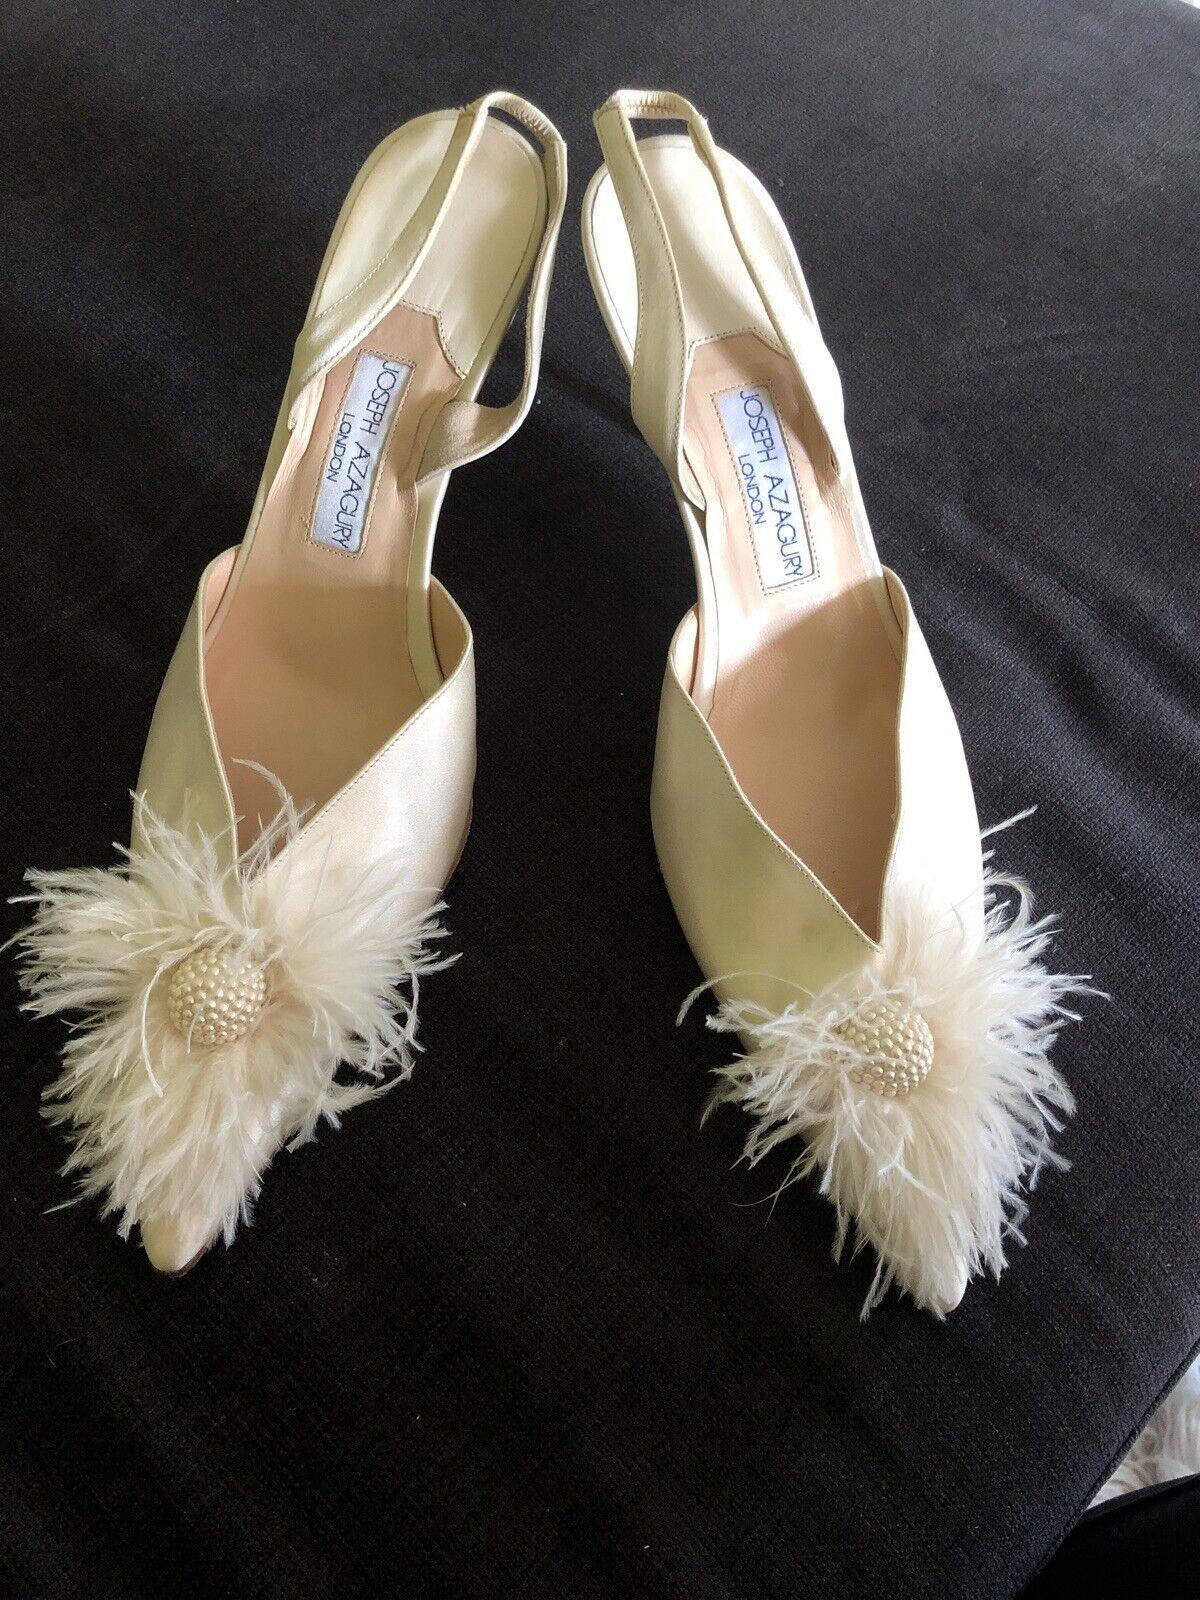 Beautiful Bridal Shoes 42, Satin, Feathers, Beads, Slingback, NEW Joseph Azagury